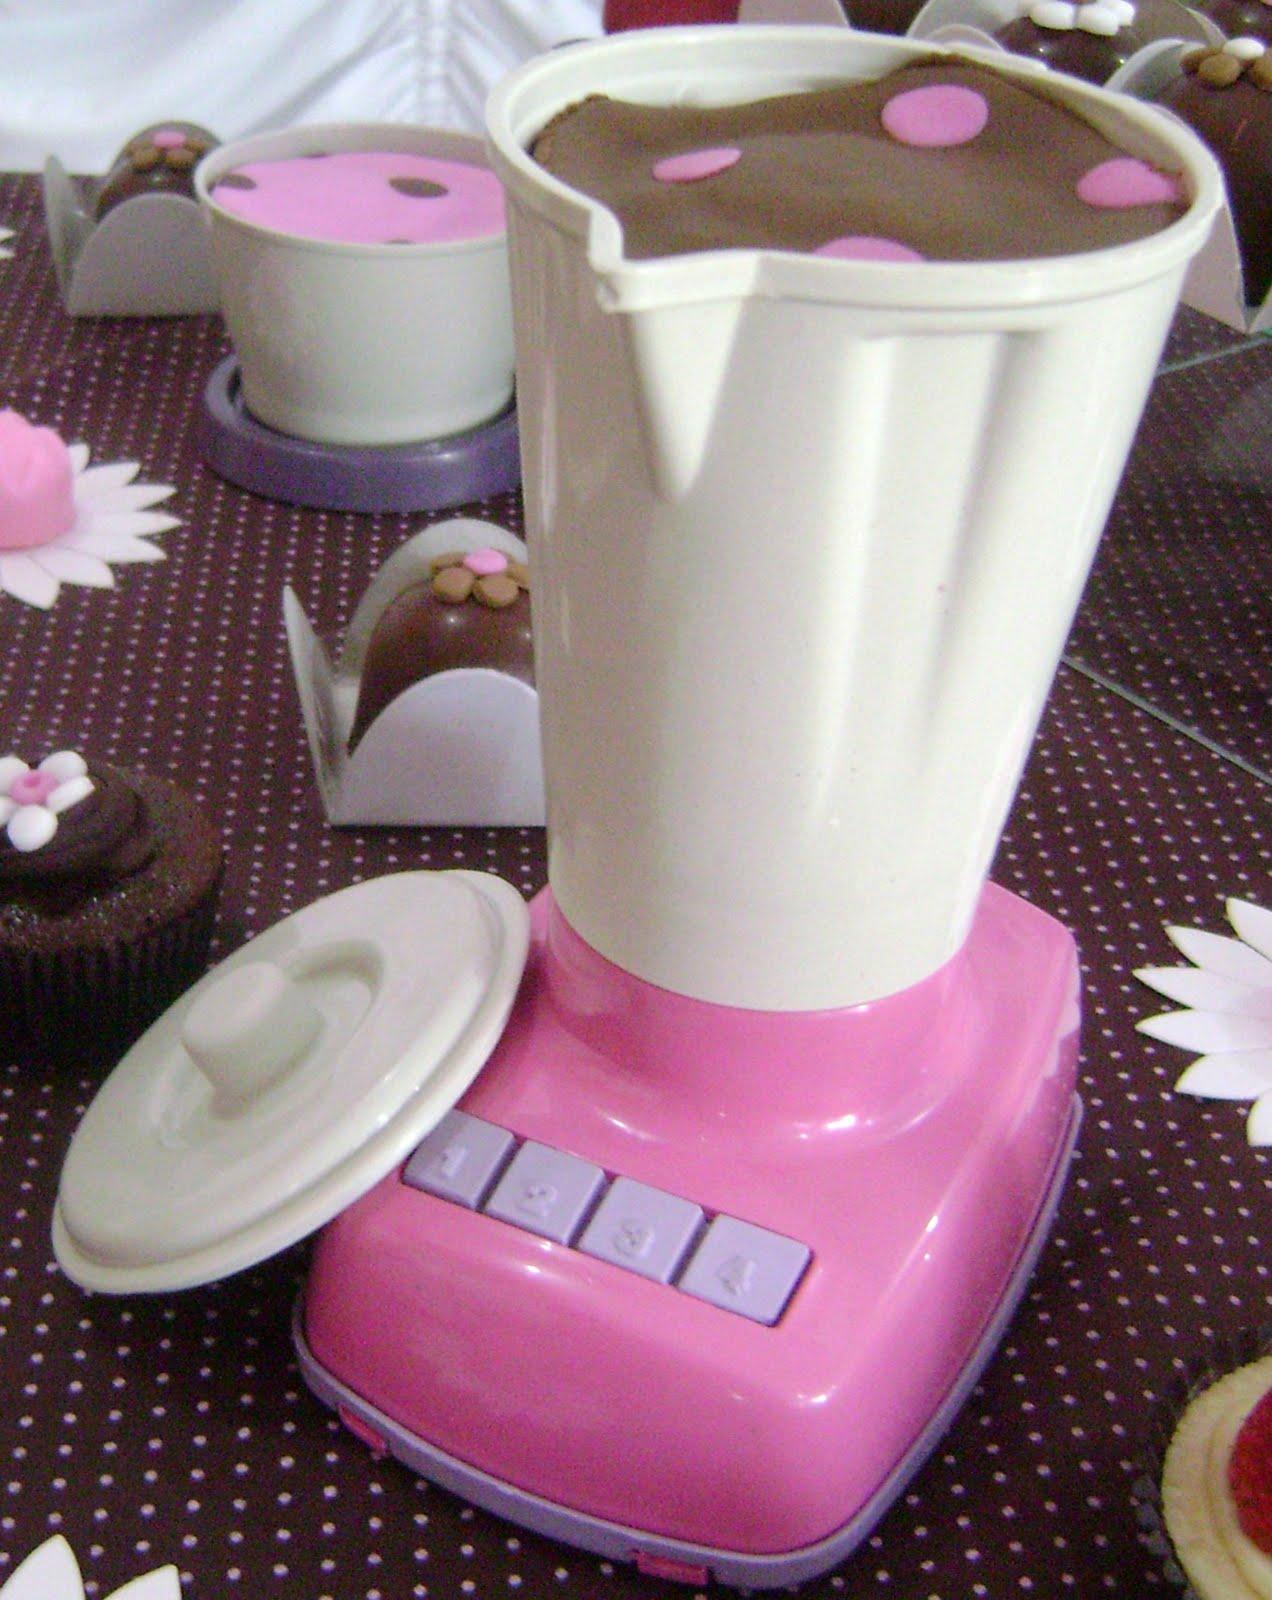 Michelle Lecce Bolos Doces e Chocolates: Chá de Panela #9B3074 1272 1600